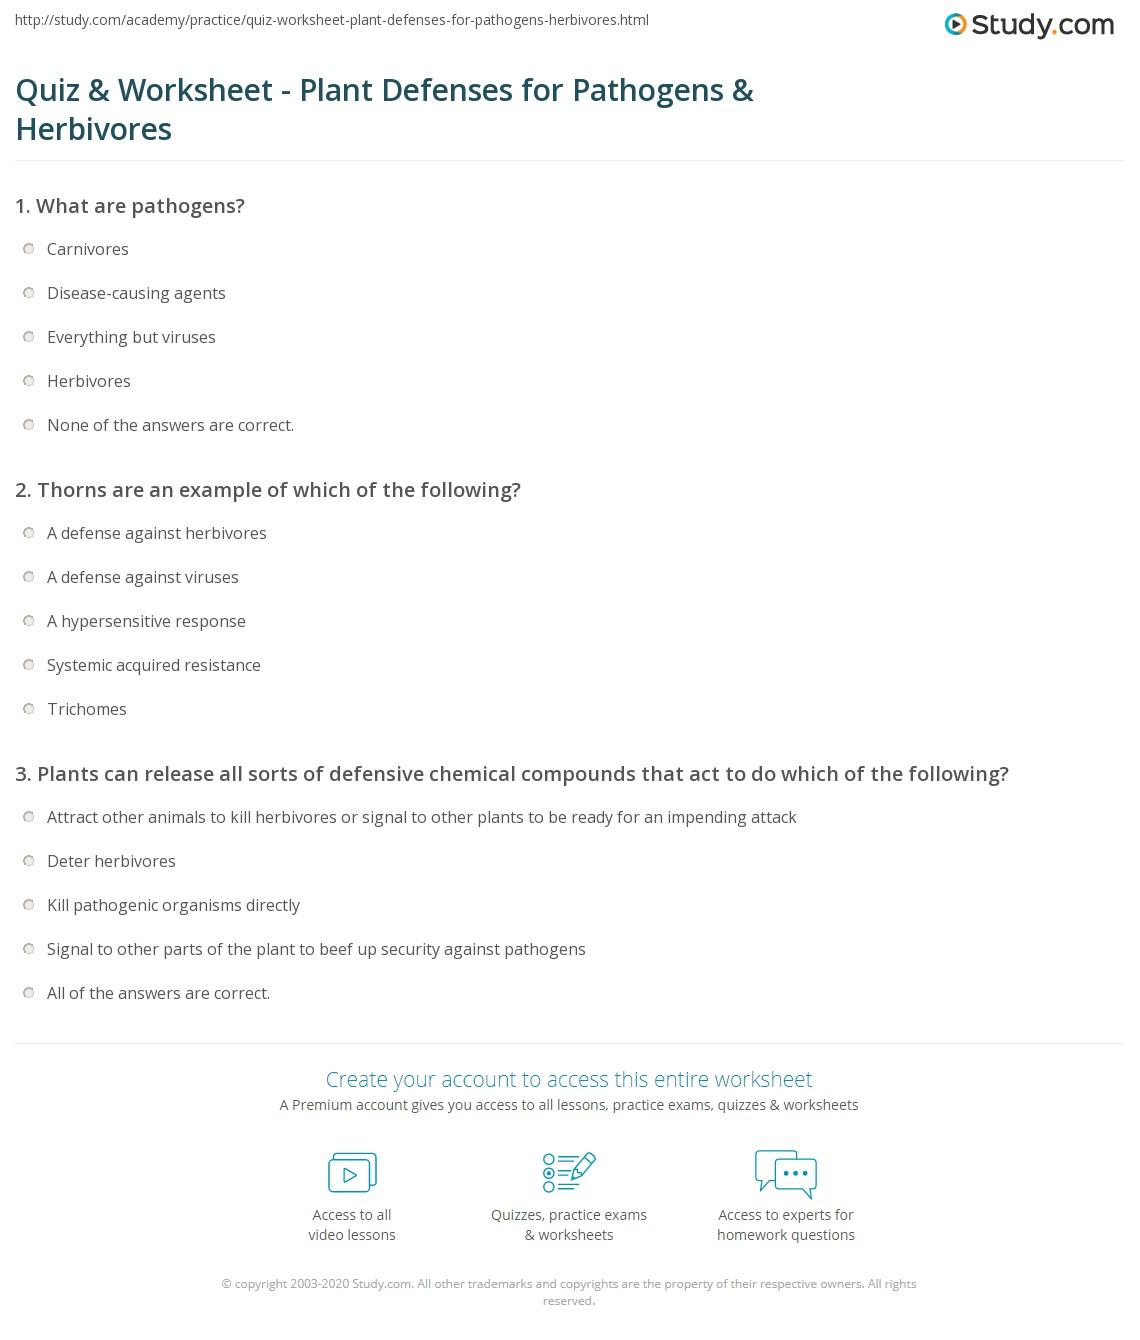 Quiz Worksheet Plant Defenses For Pathogens Herbivores